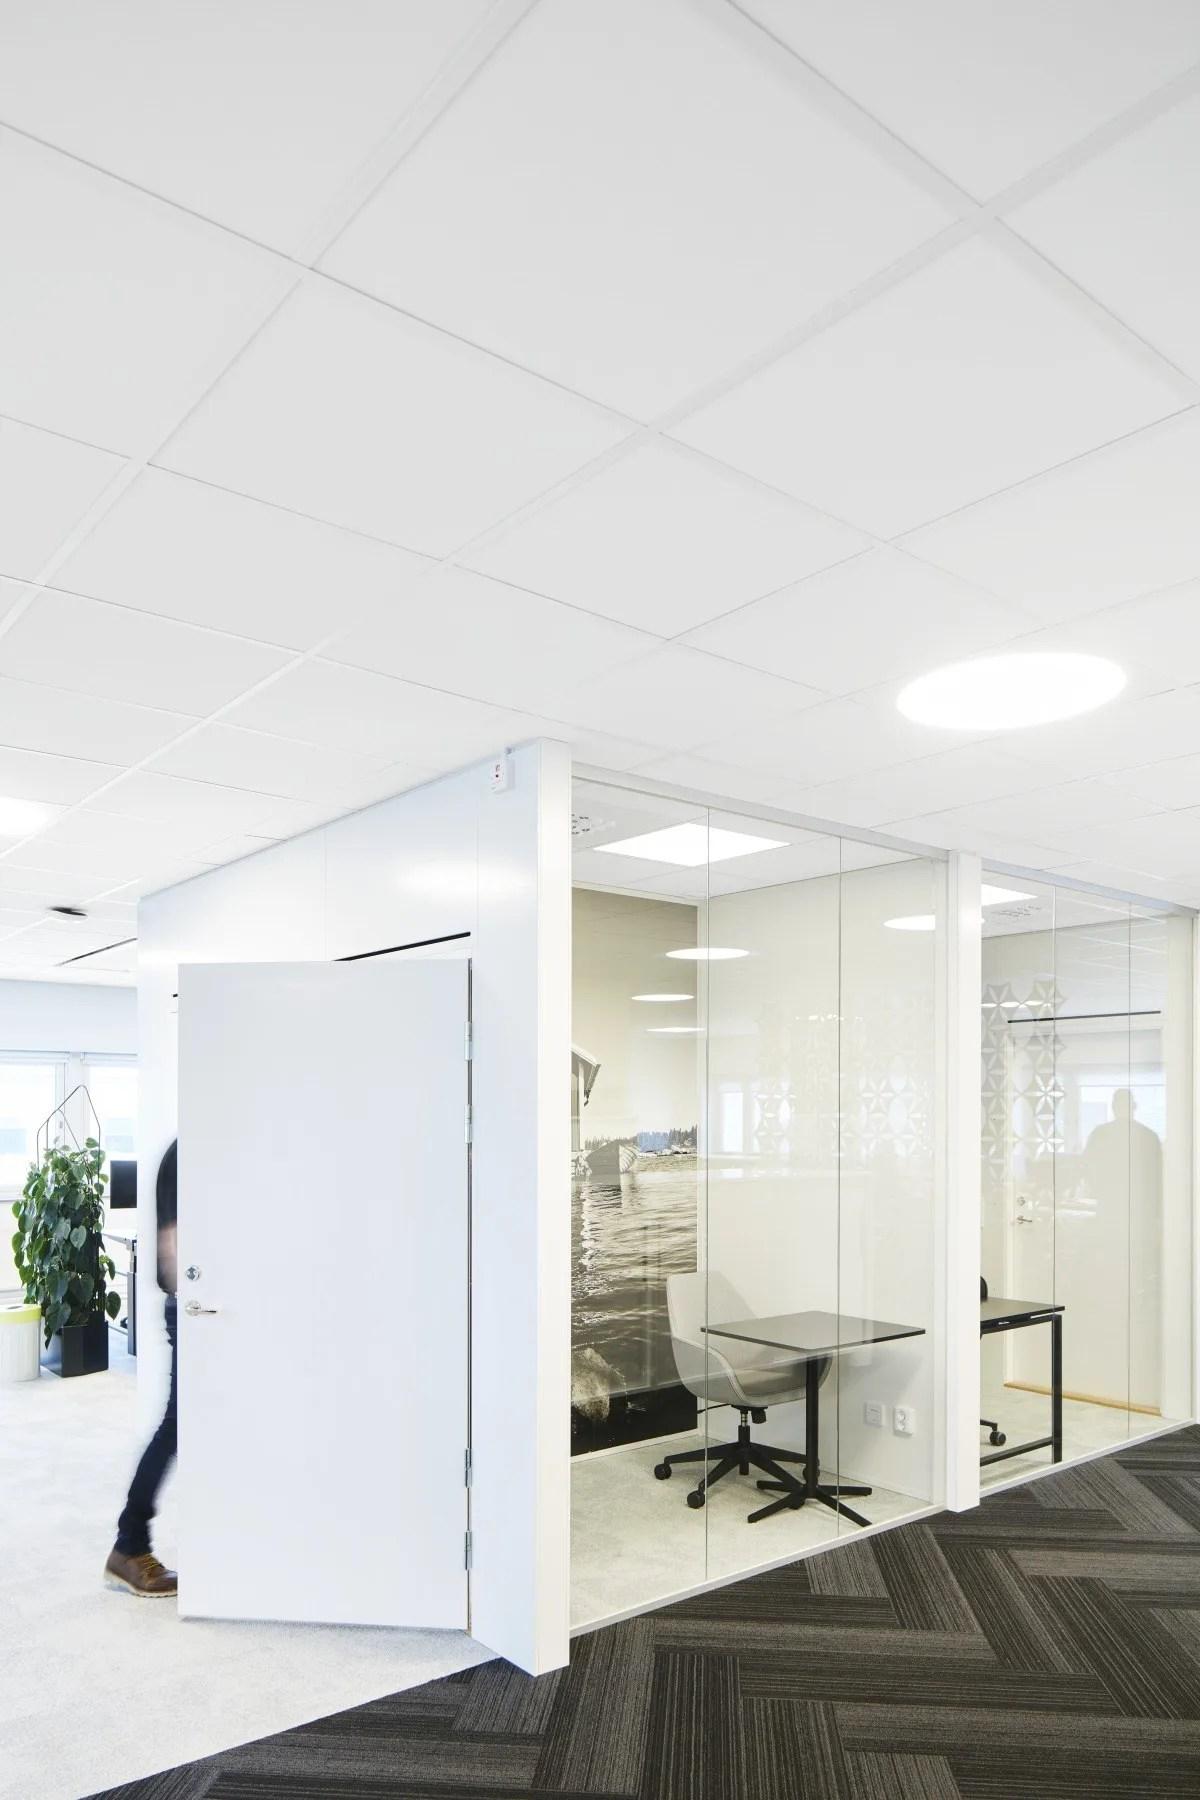 Saint gobain ceiling tiles columbialabelsfo ecophon ceiling tiles suppliers gradschoolfairs dailygadgetfo Images